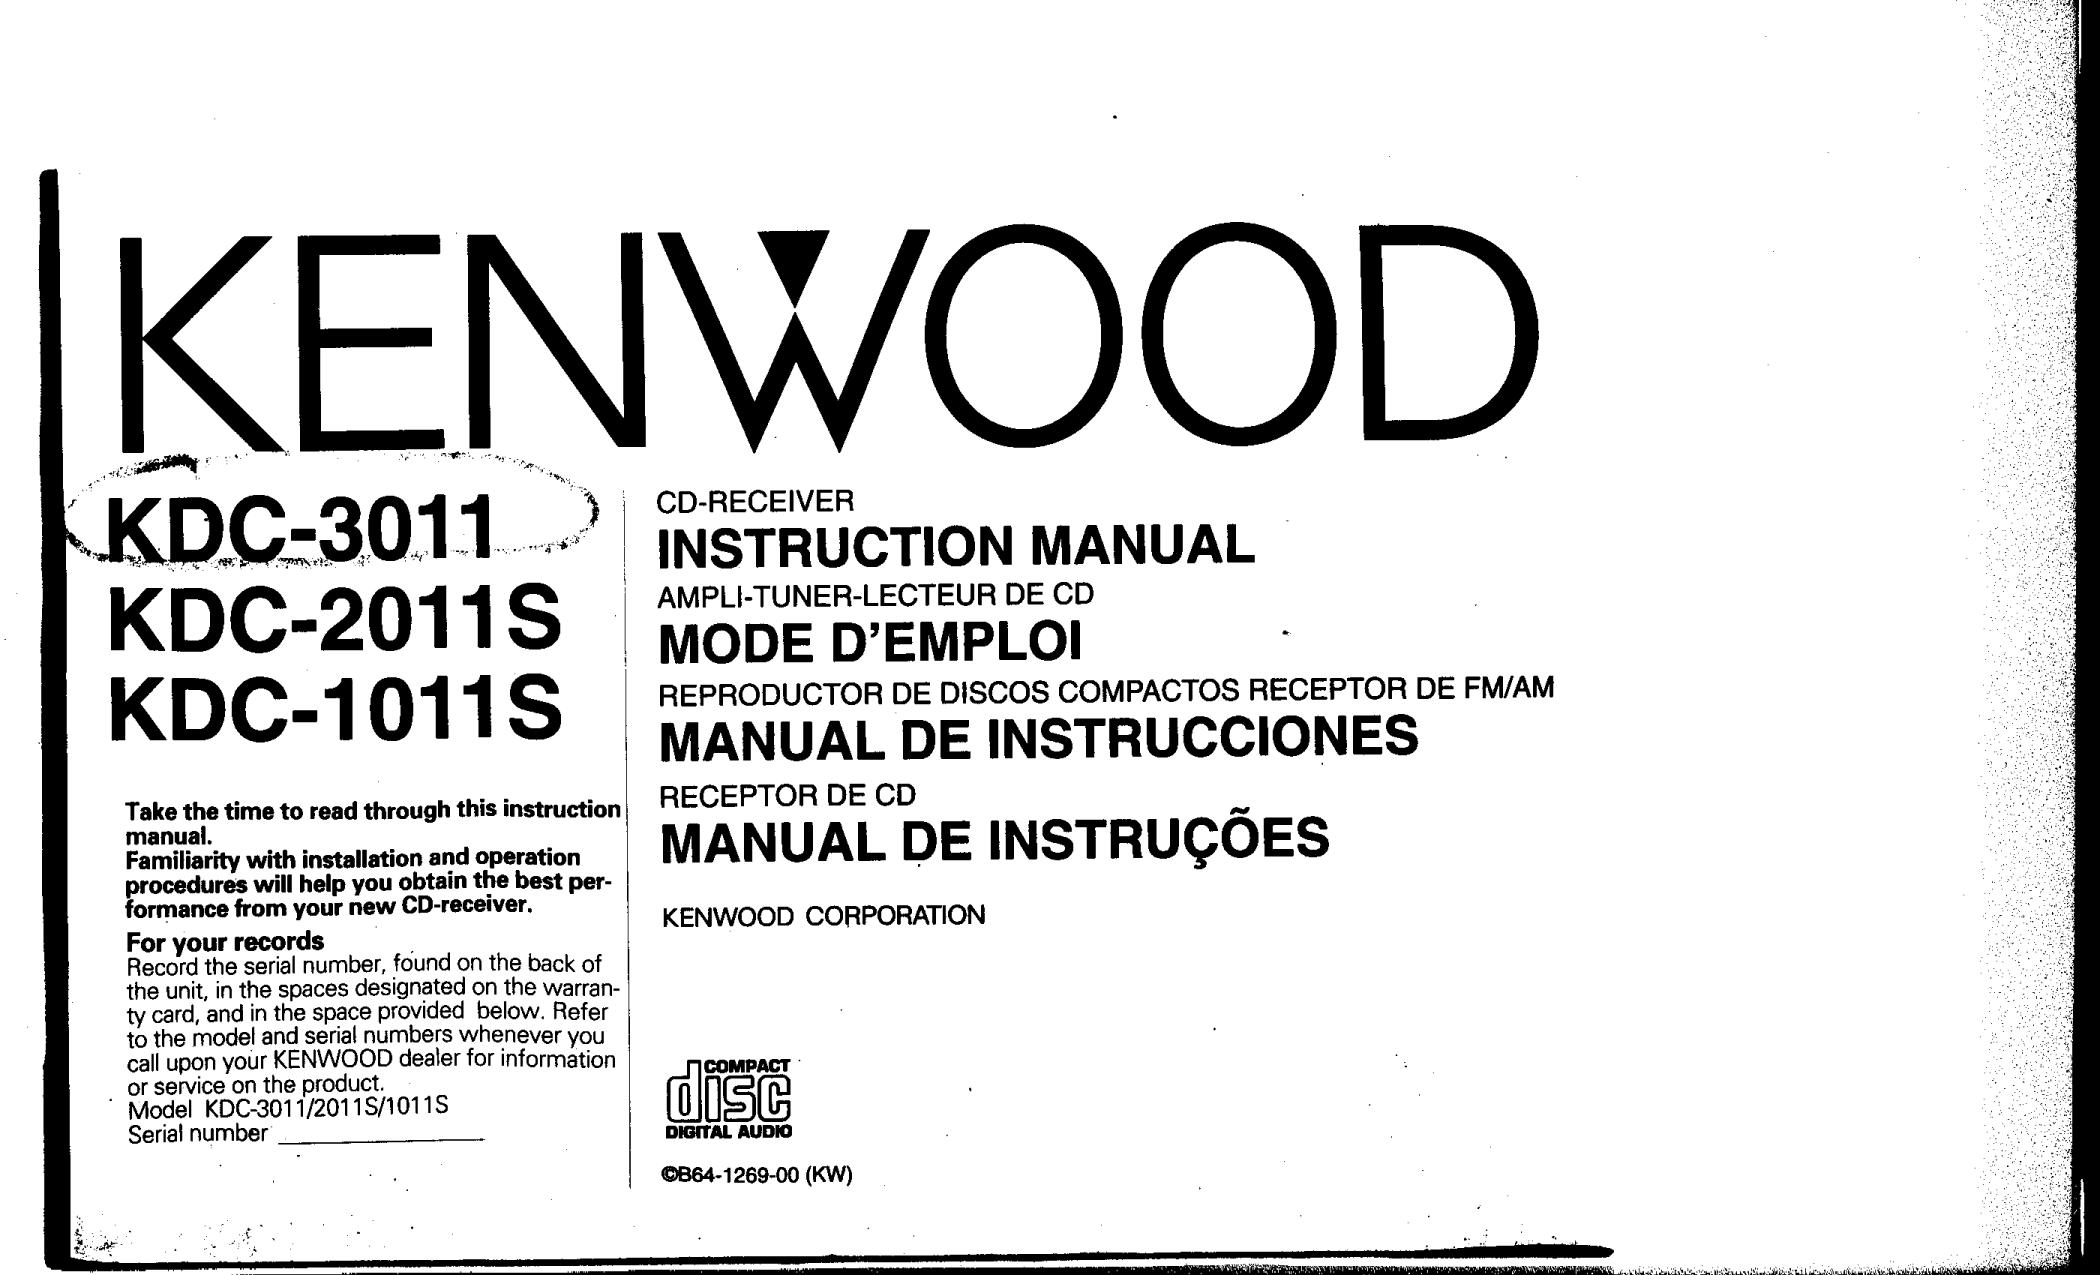 Kenwood Kdc 2011s Wiring Diagram - Wiring Diagrams List on